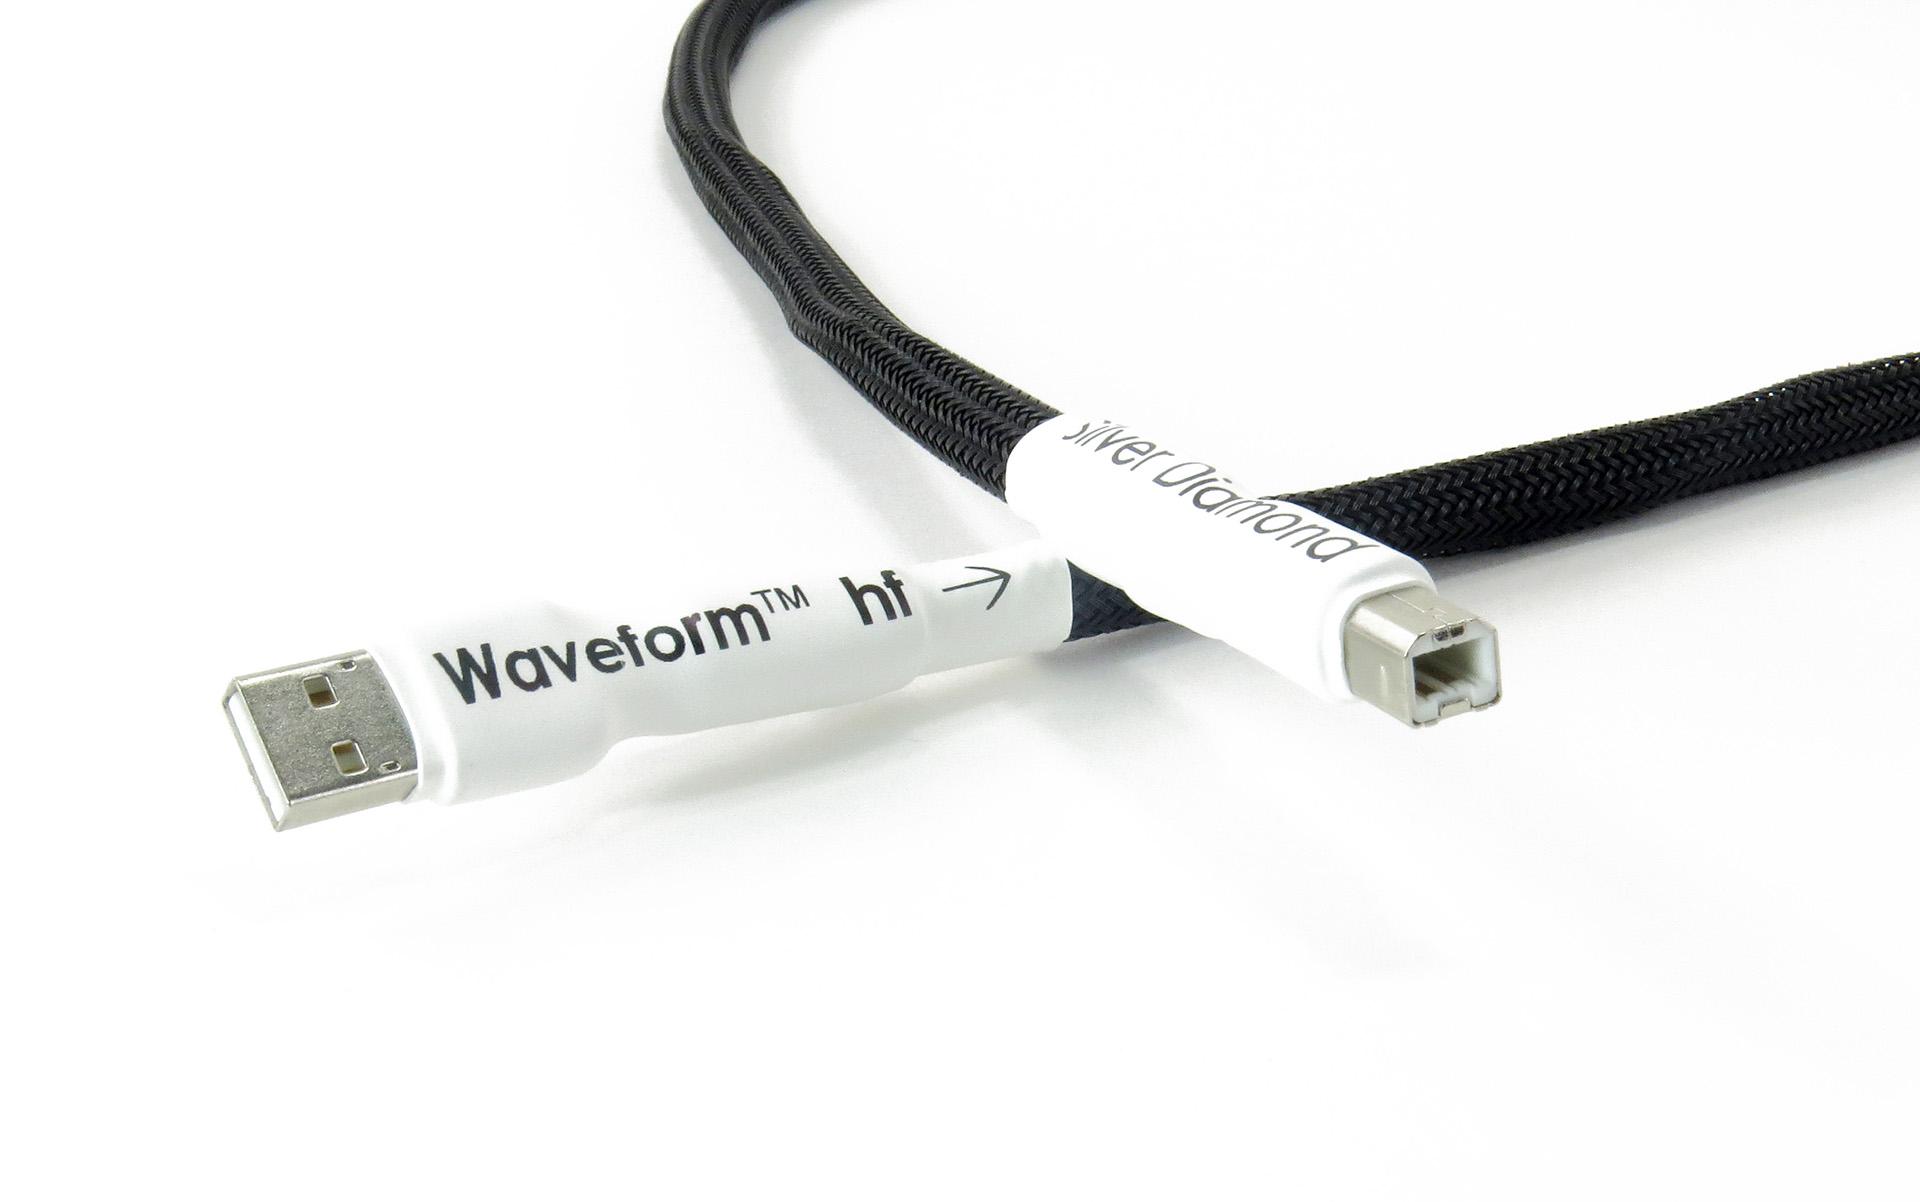 Tellurium Q | Silver Diamond | Waveform™ hf USB Cable